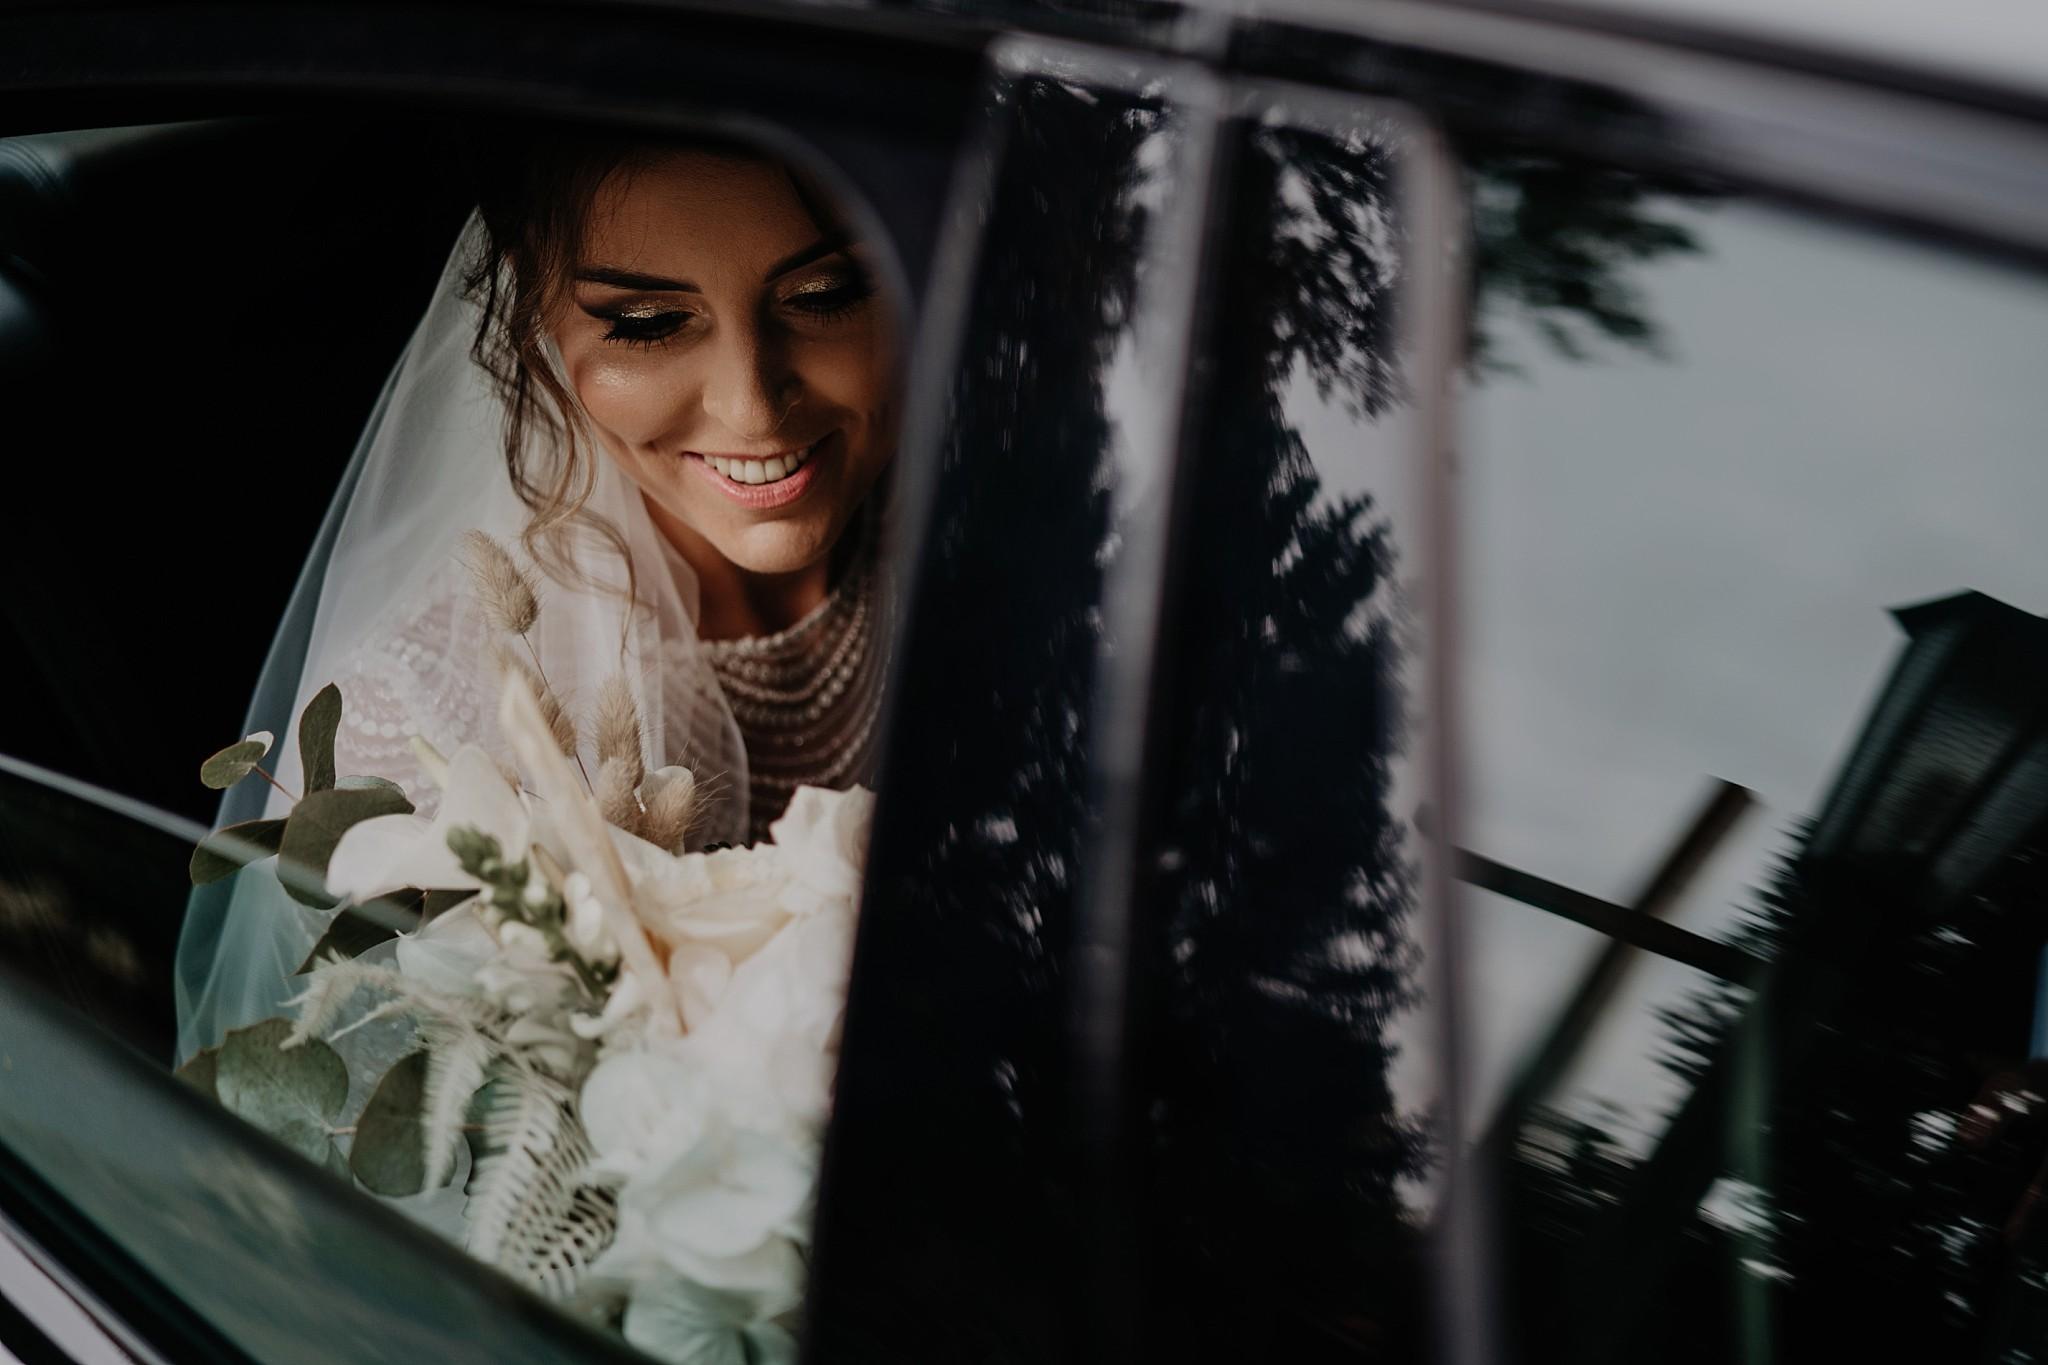 fotograf poznan wesele dobra truskawka piekne wesele pod poznaniem wesele w dobrej truskawce piekna para mloda slub marzen slub koronawirus slub listopad wesele koronawirus 123